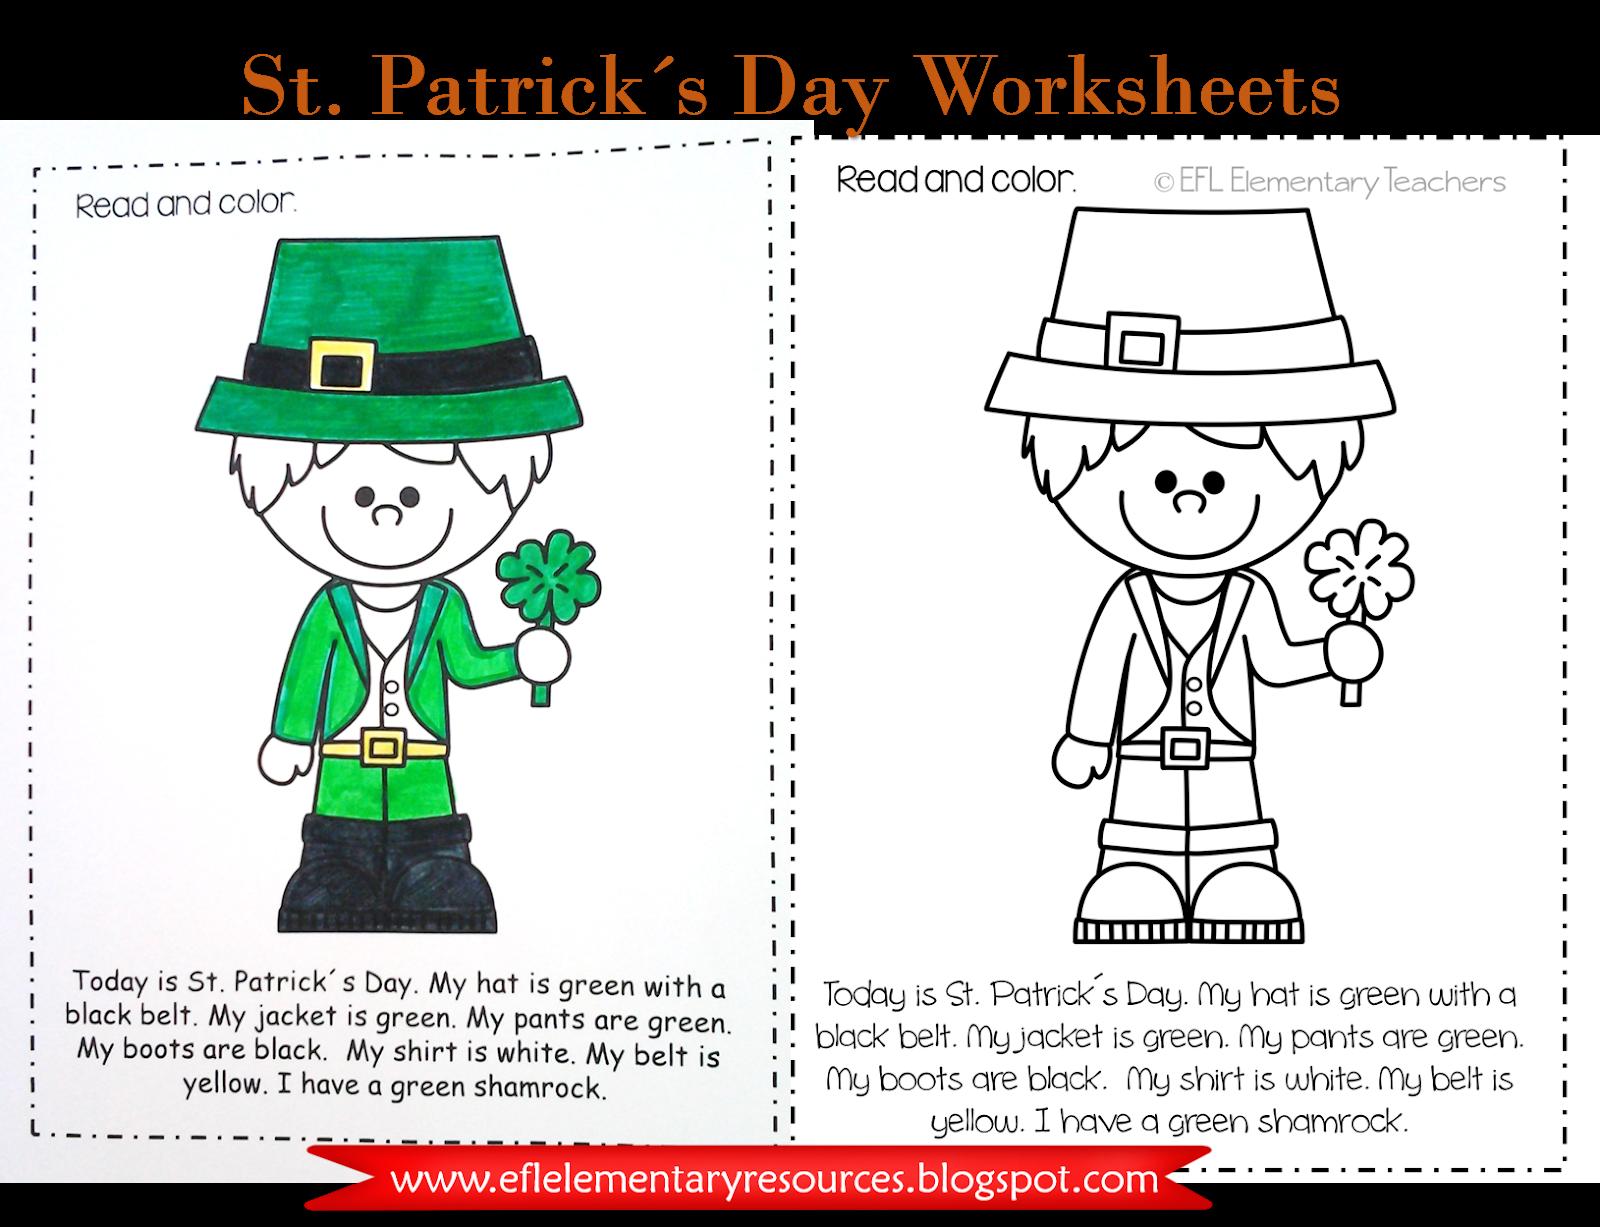 Efl Elementary Teachers St Patrick S Day